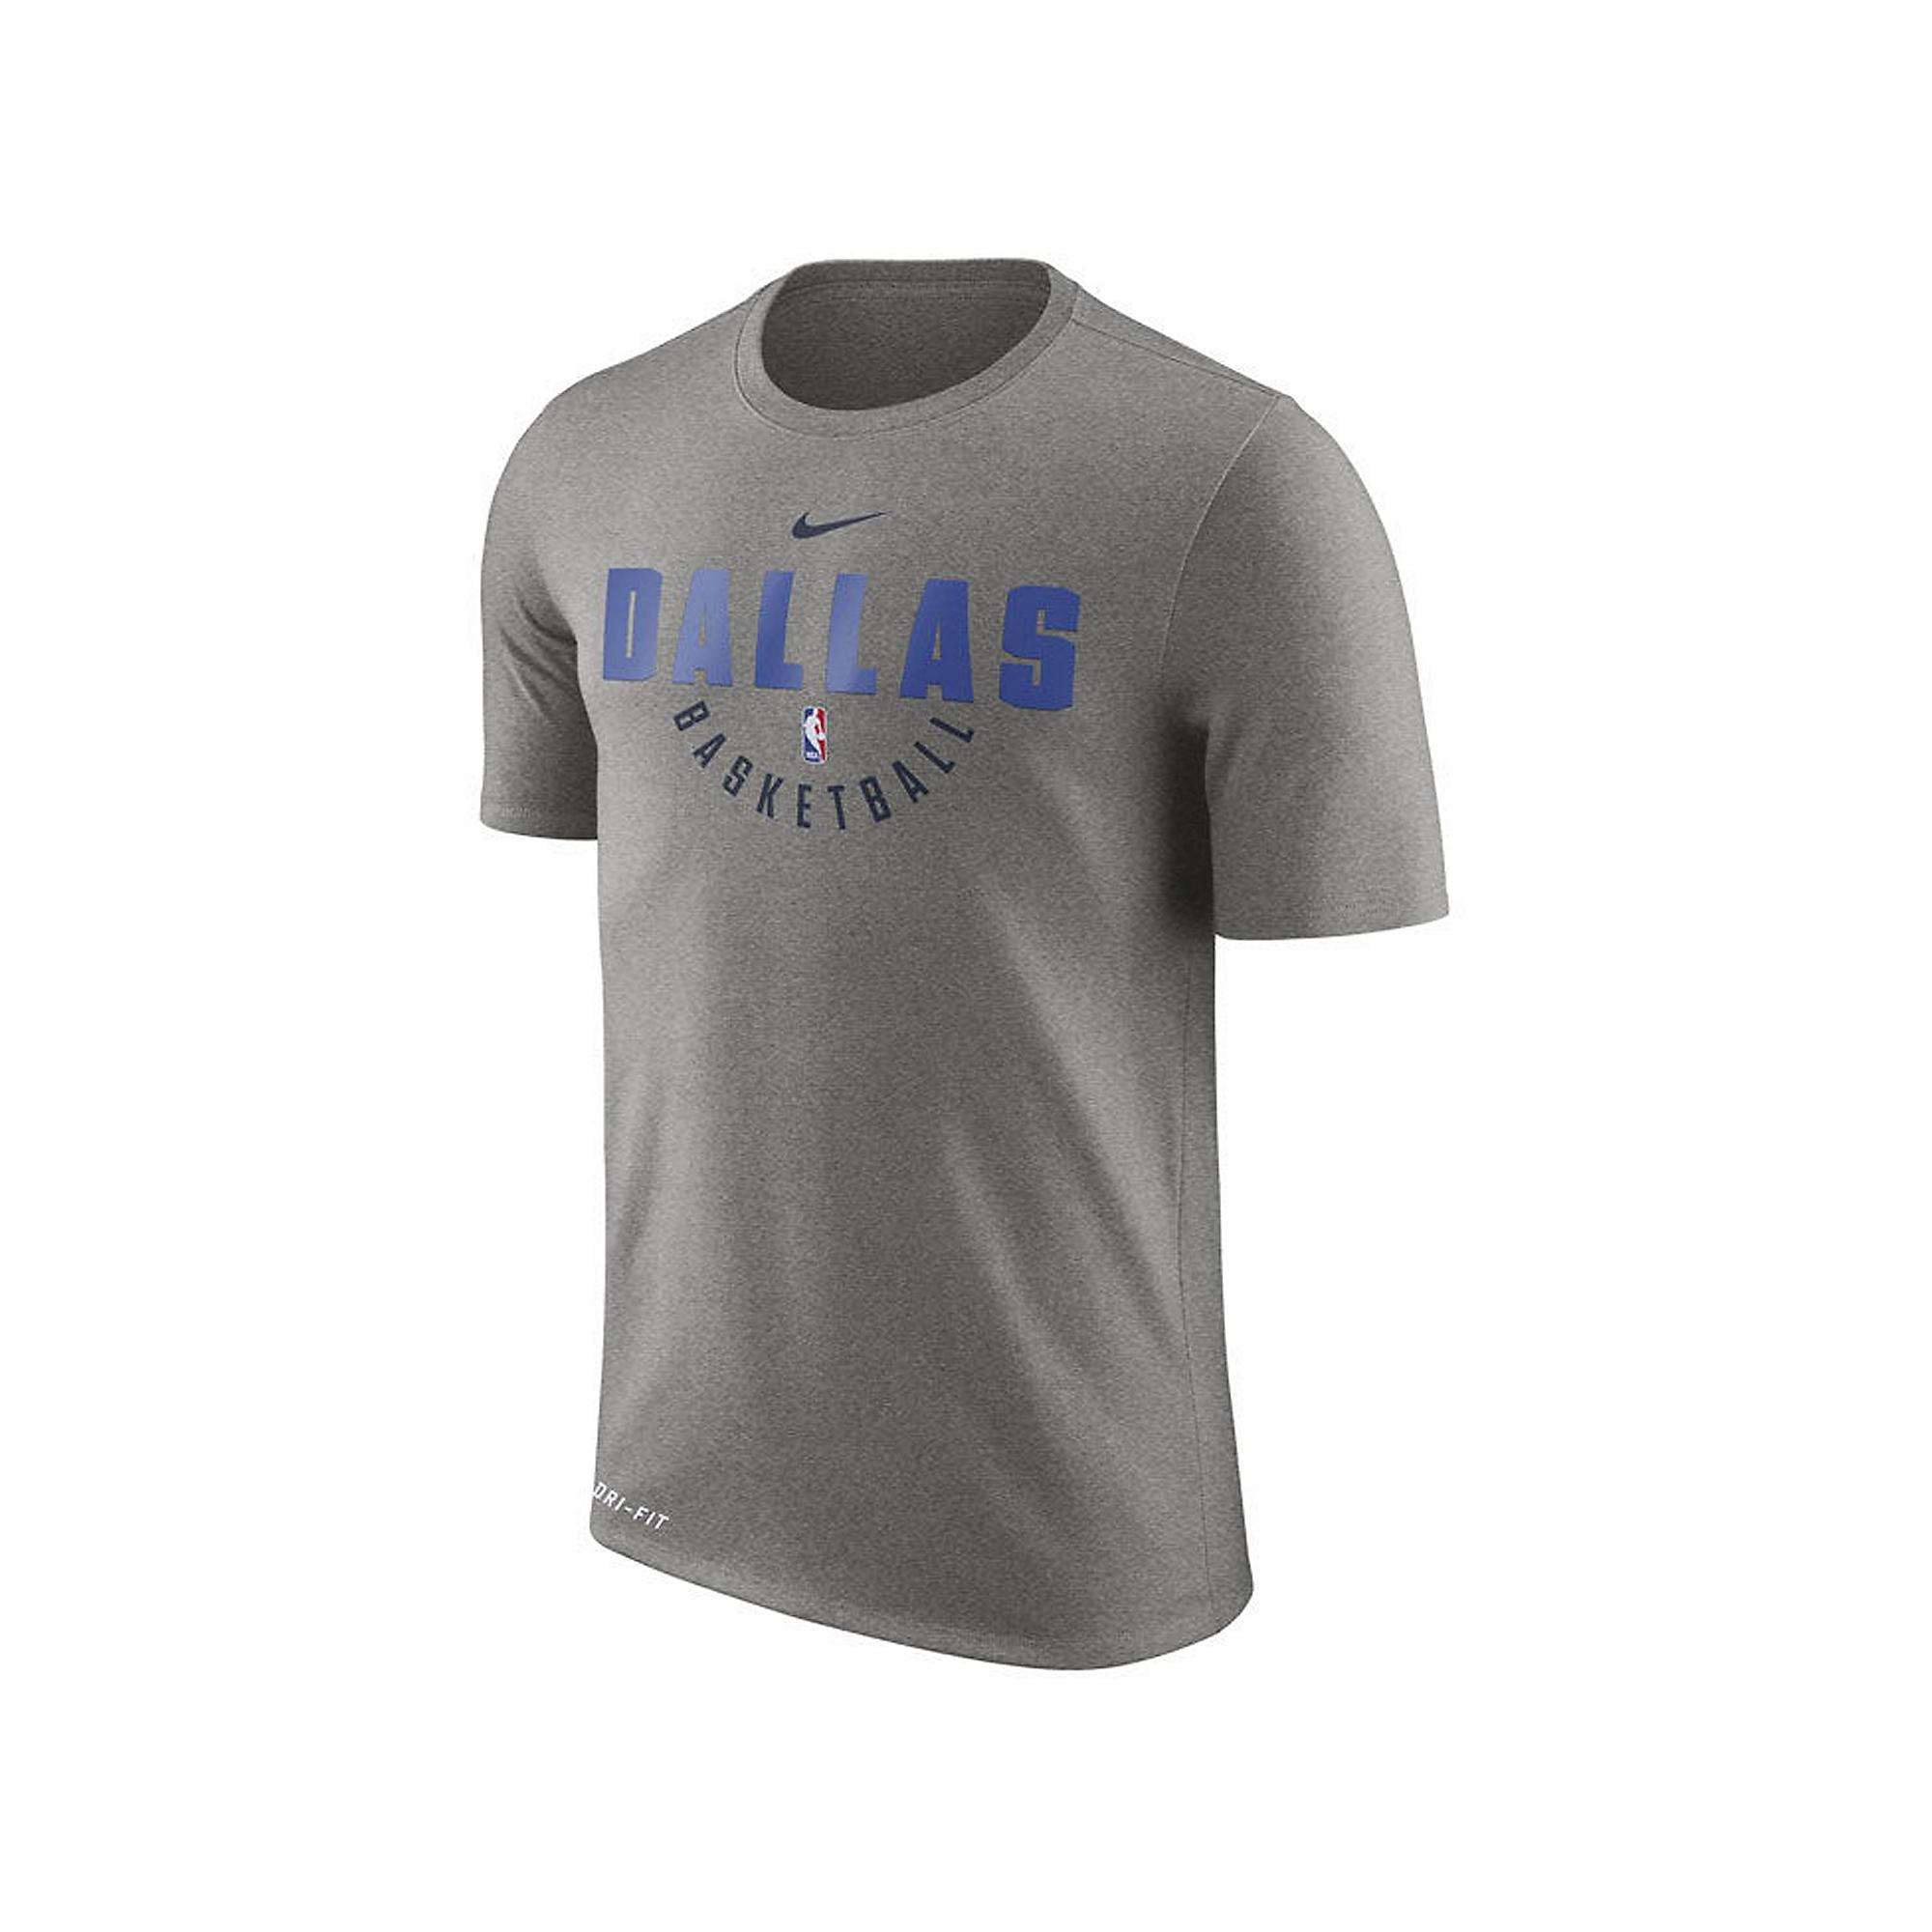 Dallas Mavericks Nike Dri-FIT Practice Short Sleeve T-Shirt